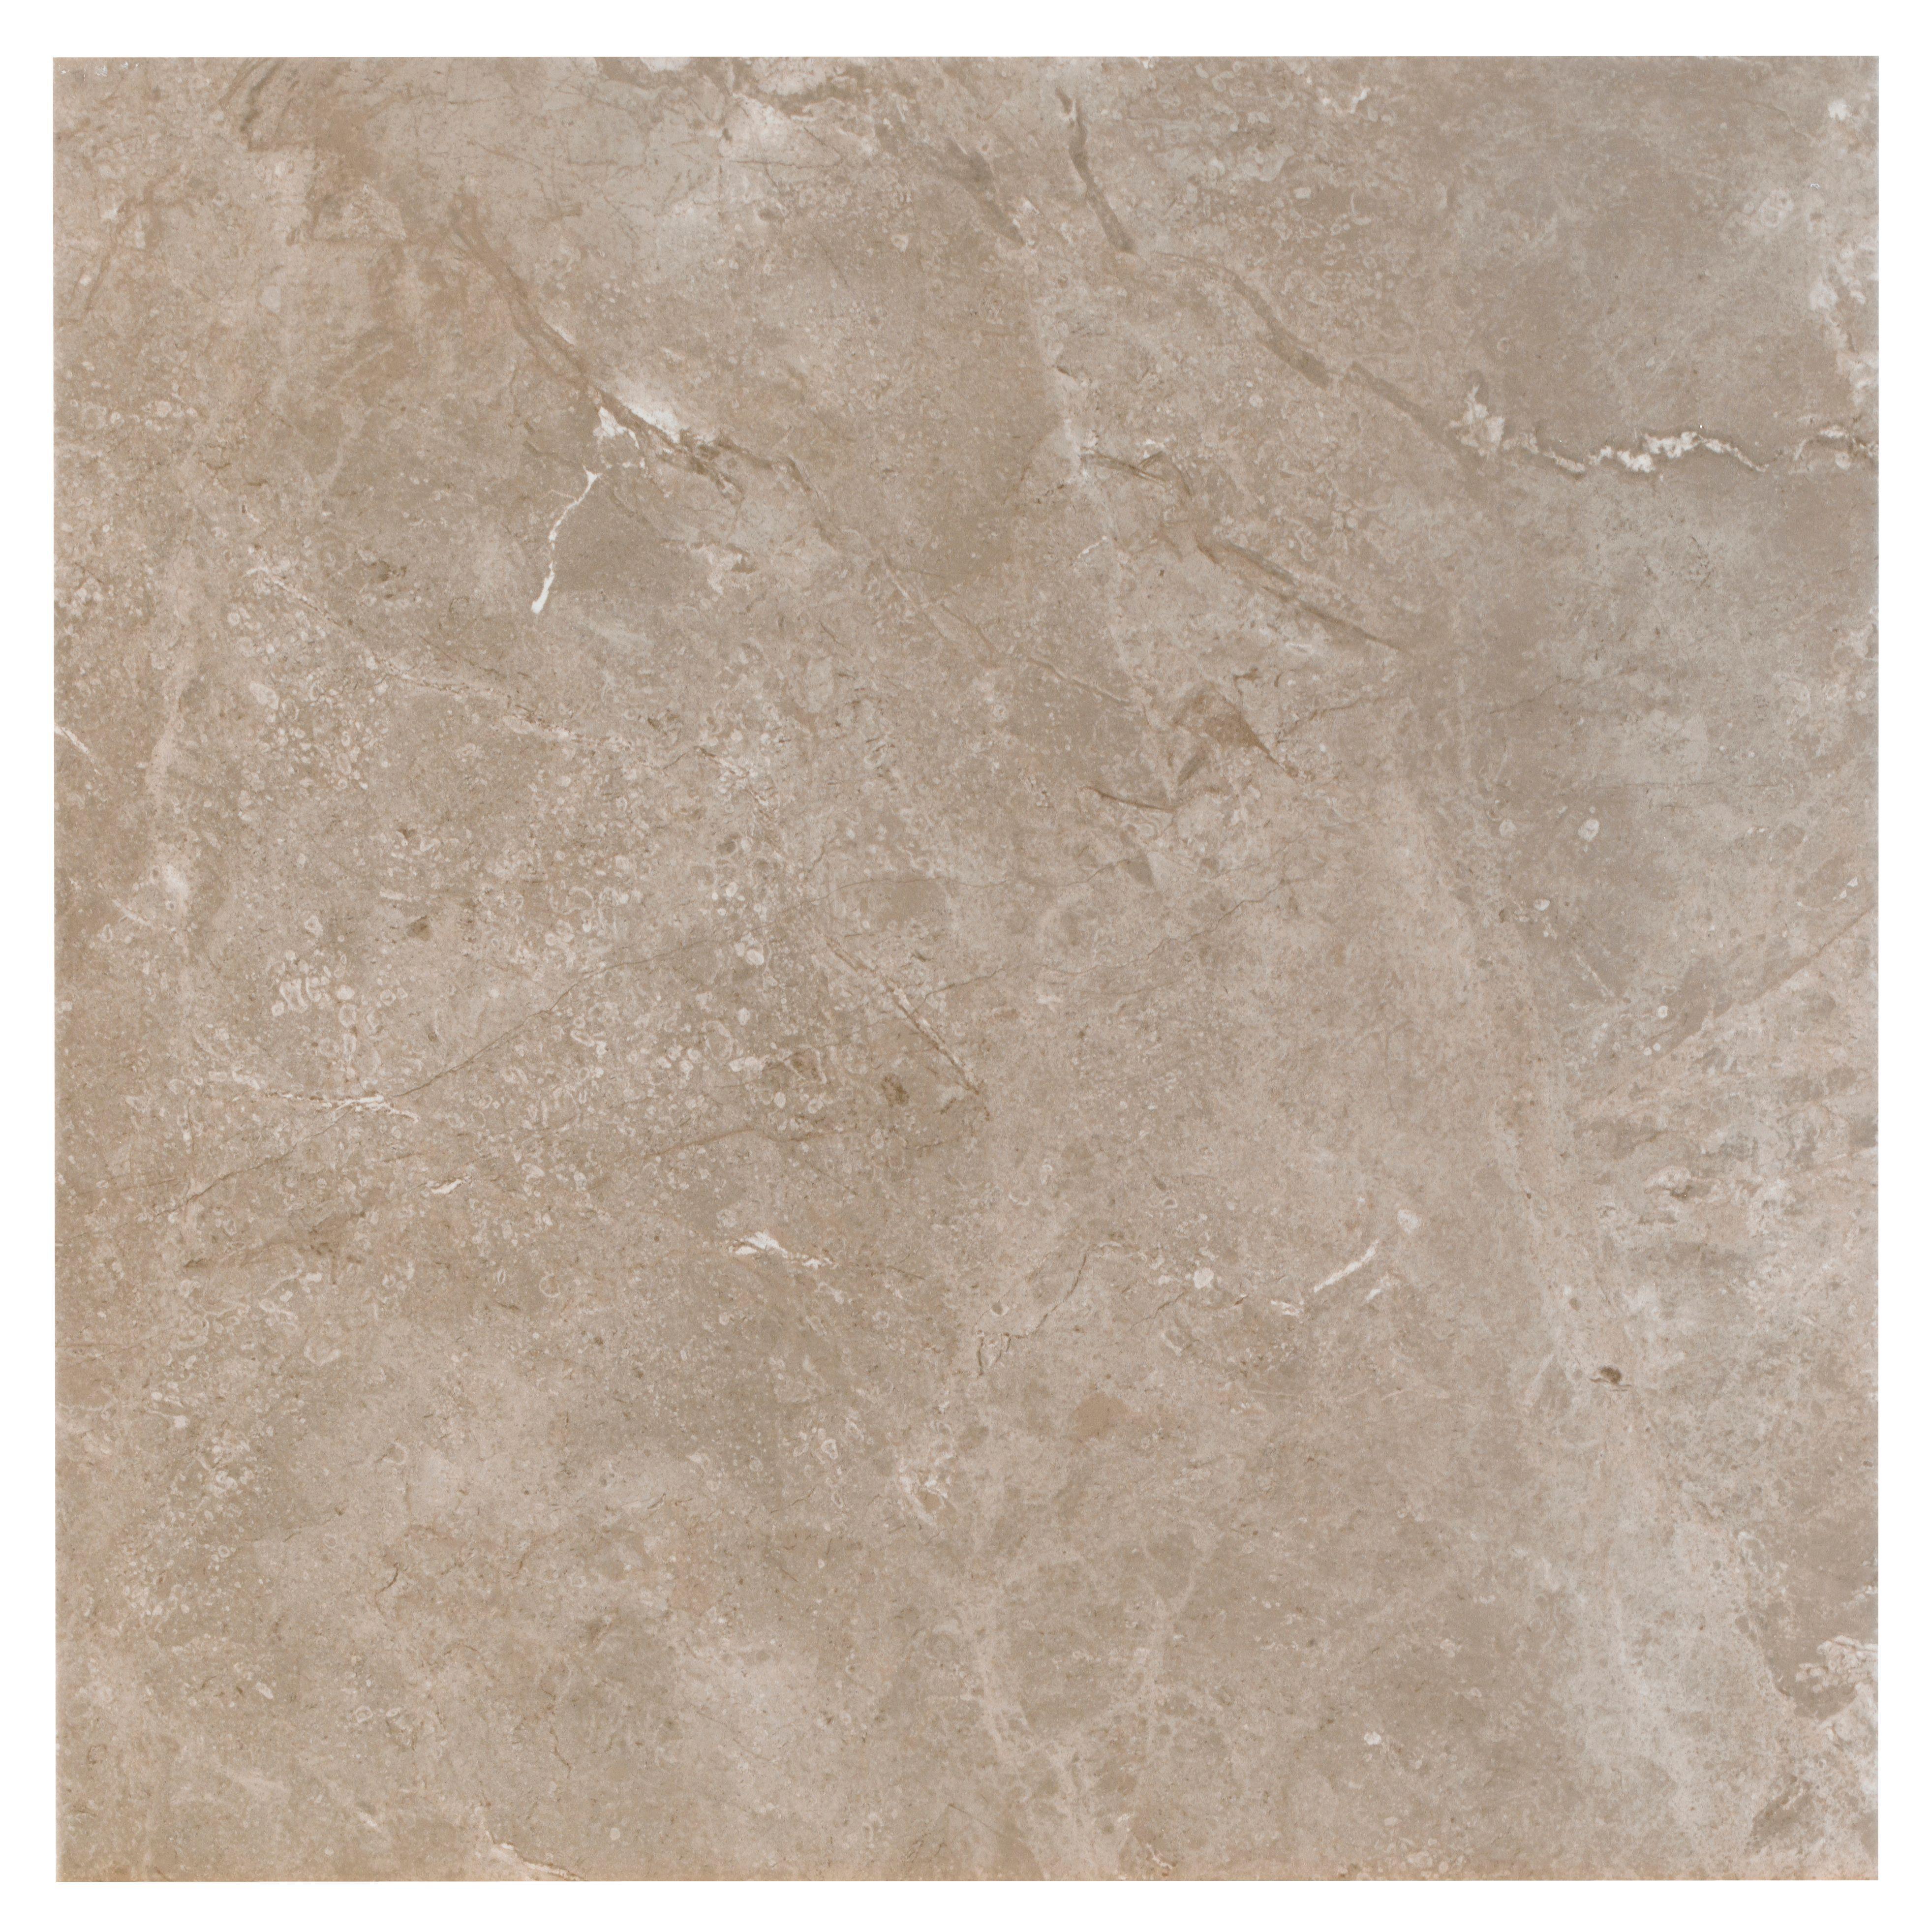 Urban White Stone Effect Ceramic Wall Floor Tile Pack: Burlington Limestone Earth Riven Stone Effect Ceramic Wall